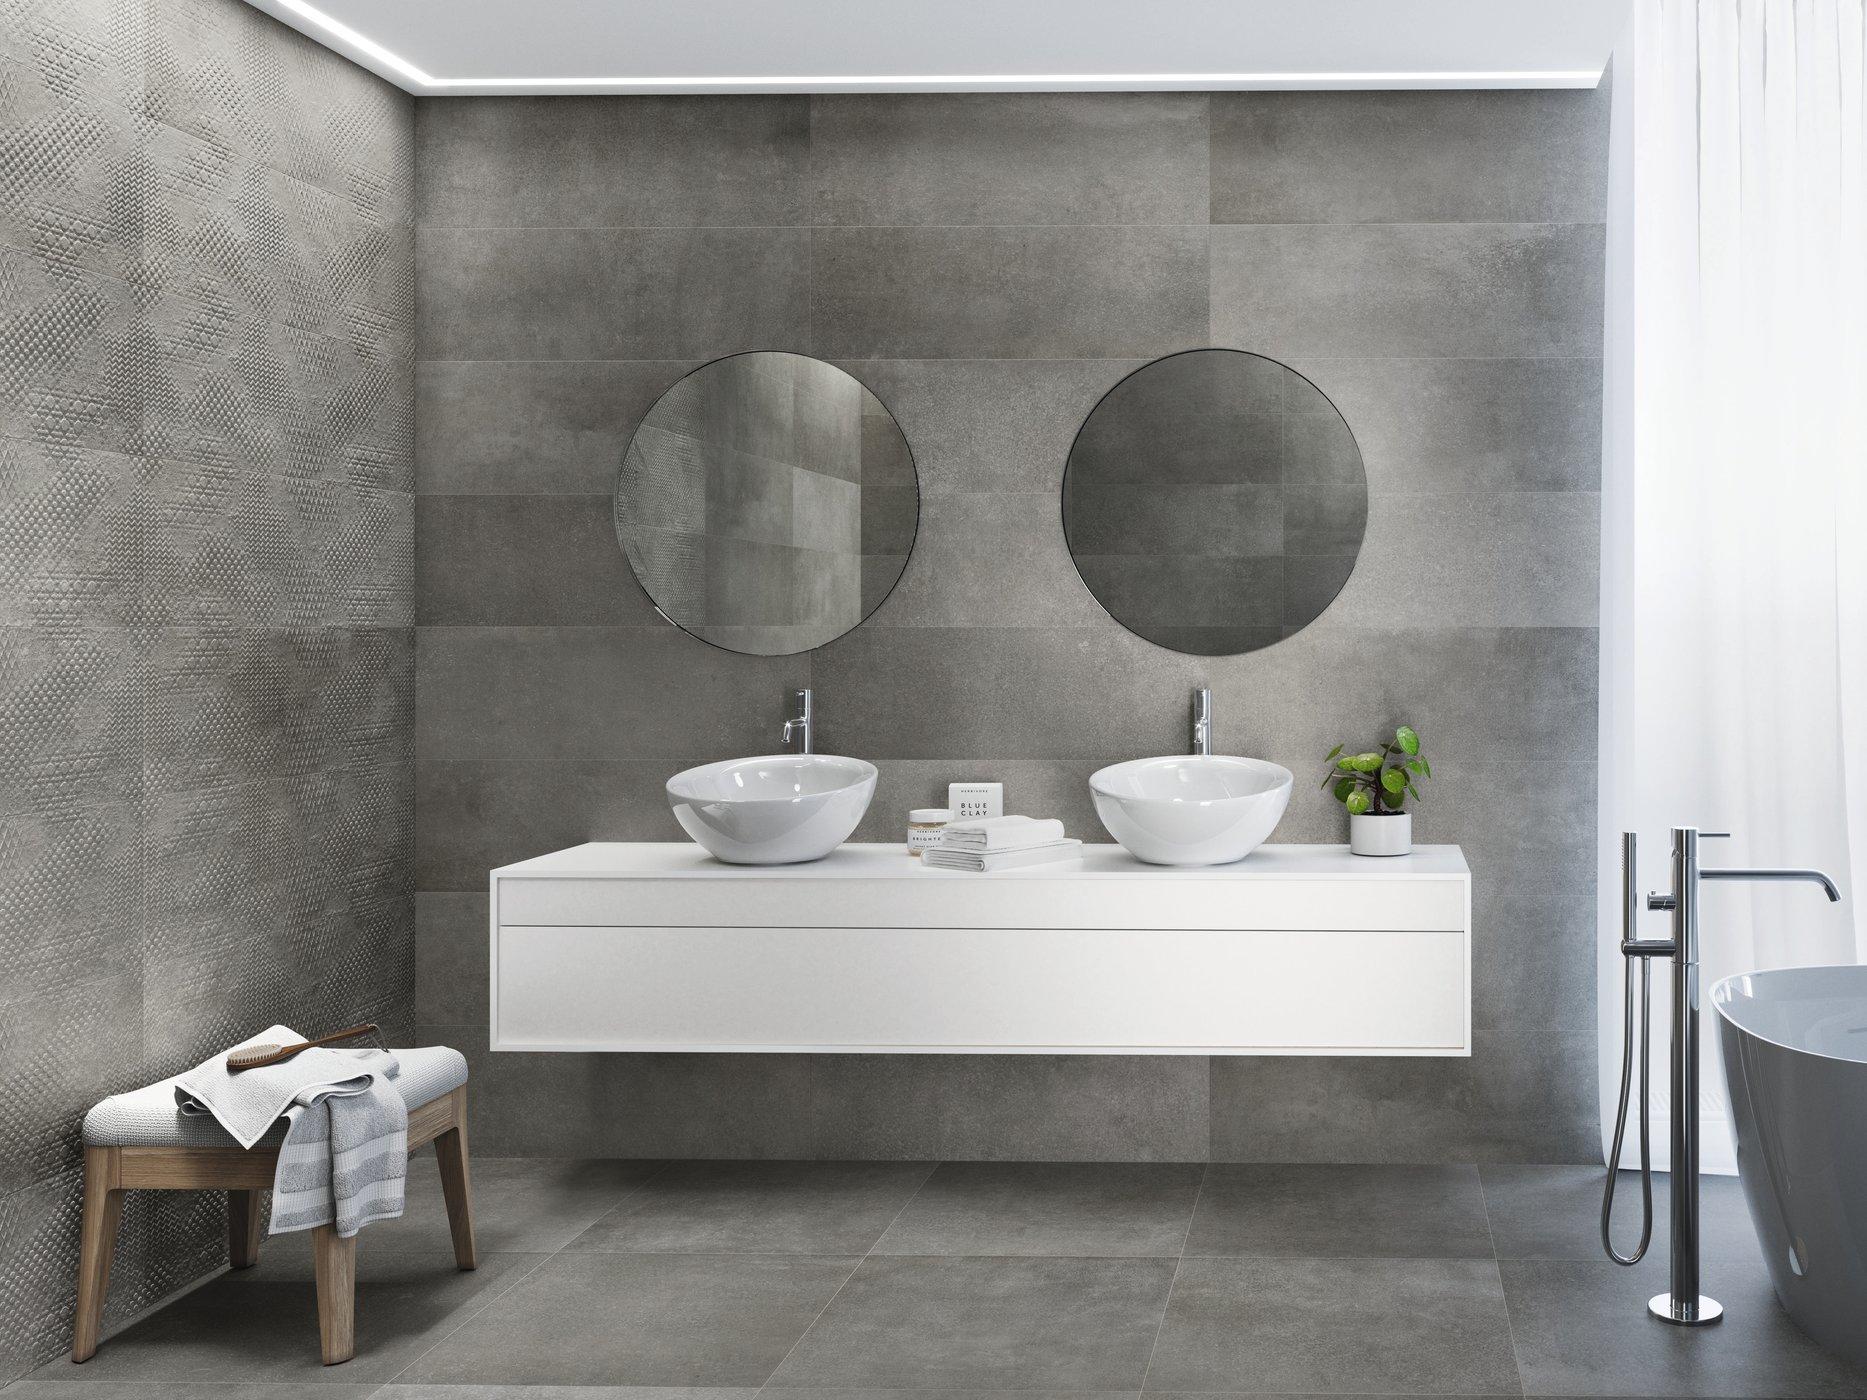 Betonhome grey 30 x90 cm. Magna Betonhome grey 30 x 90 cm. Pavimento Betonhome grey 60 x 60 cm